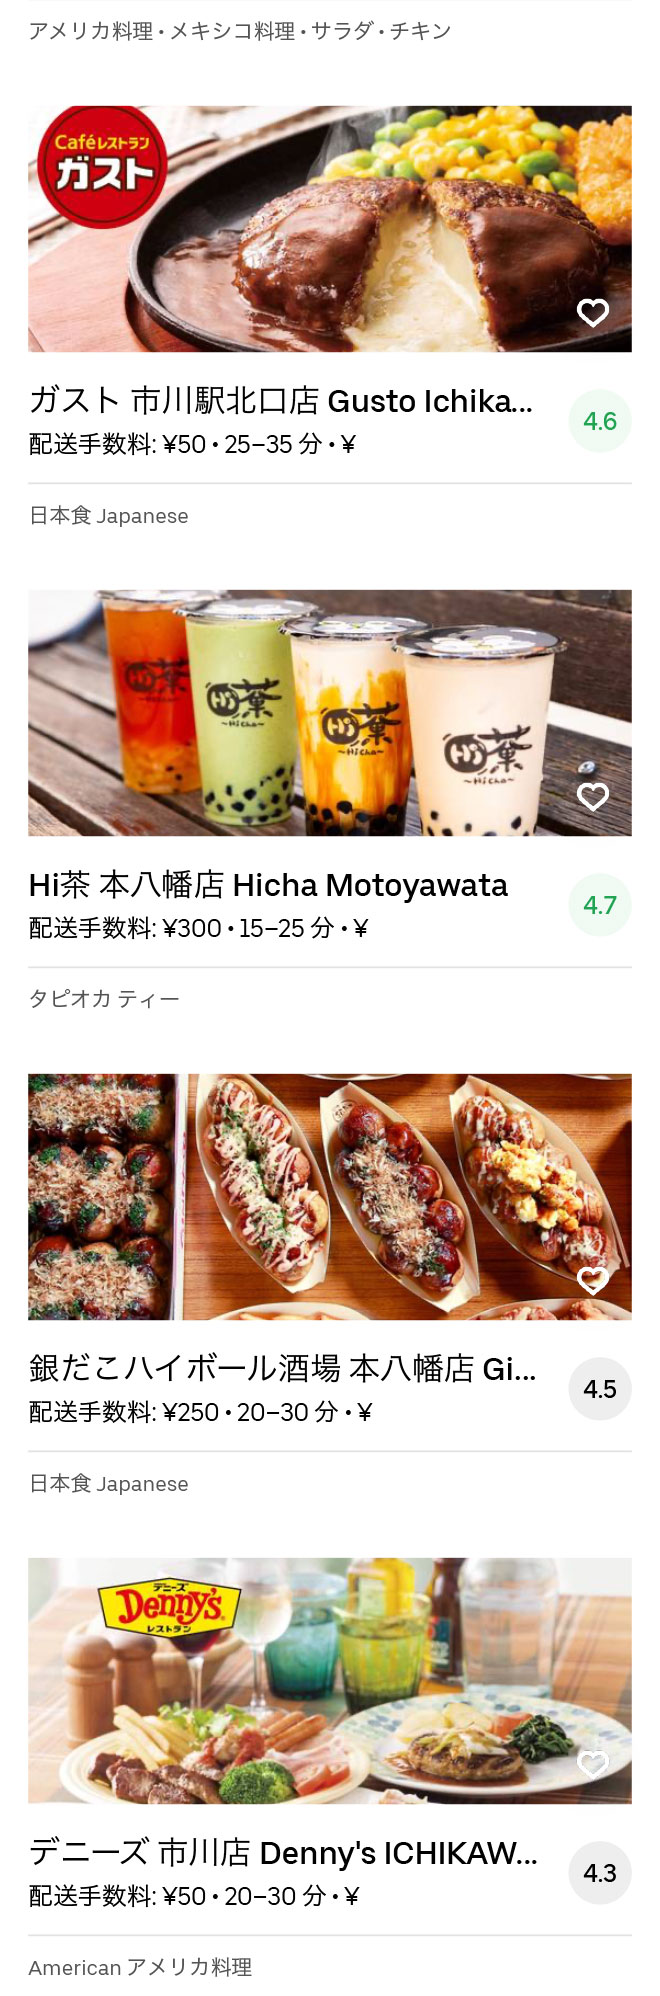 Ichikawa menu 2004 04